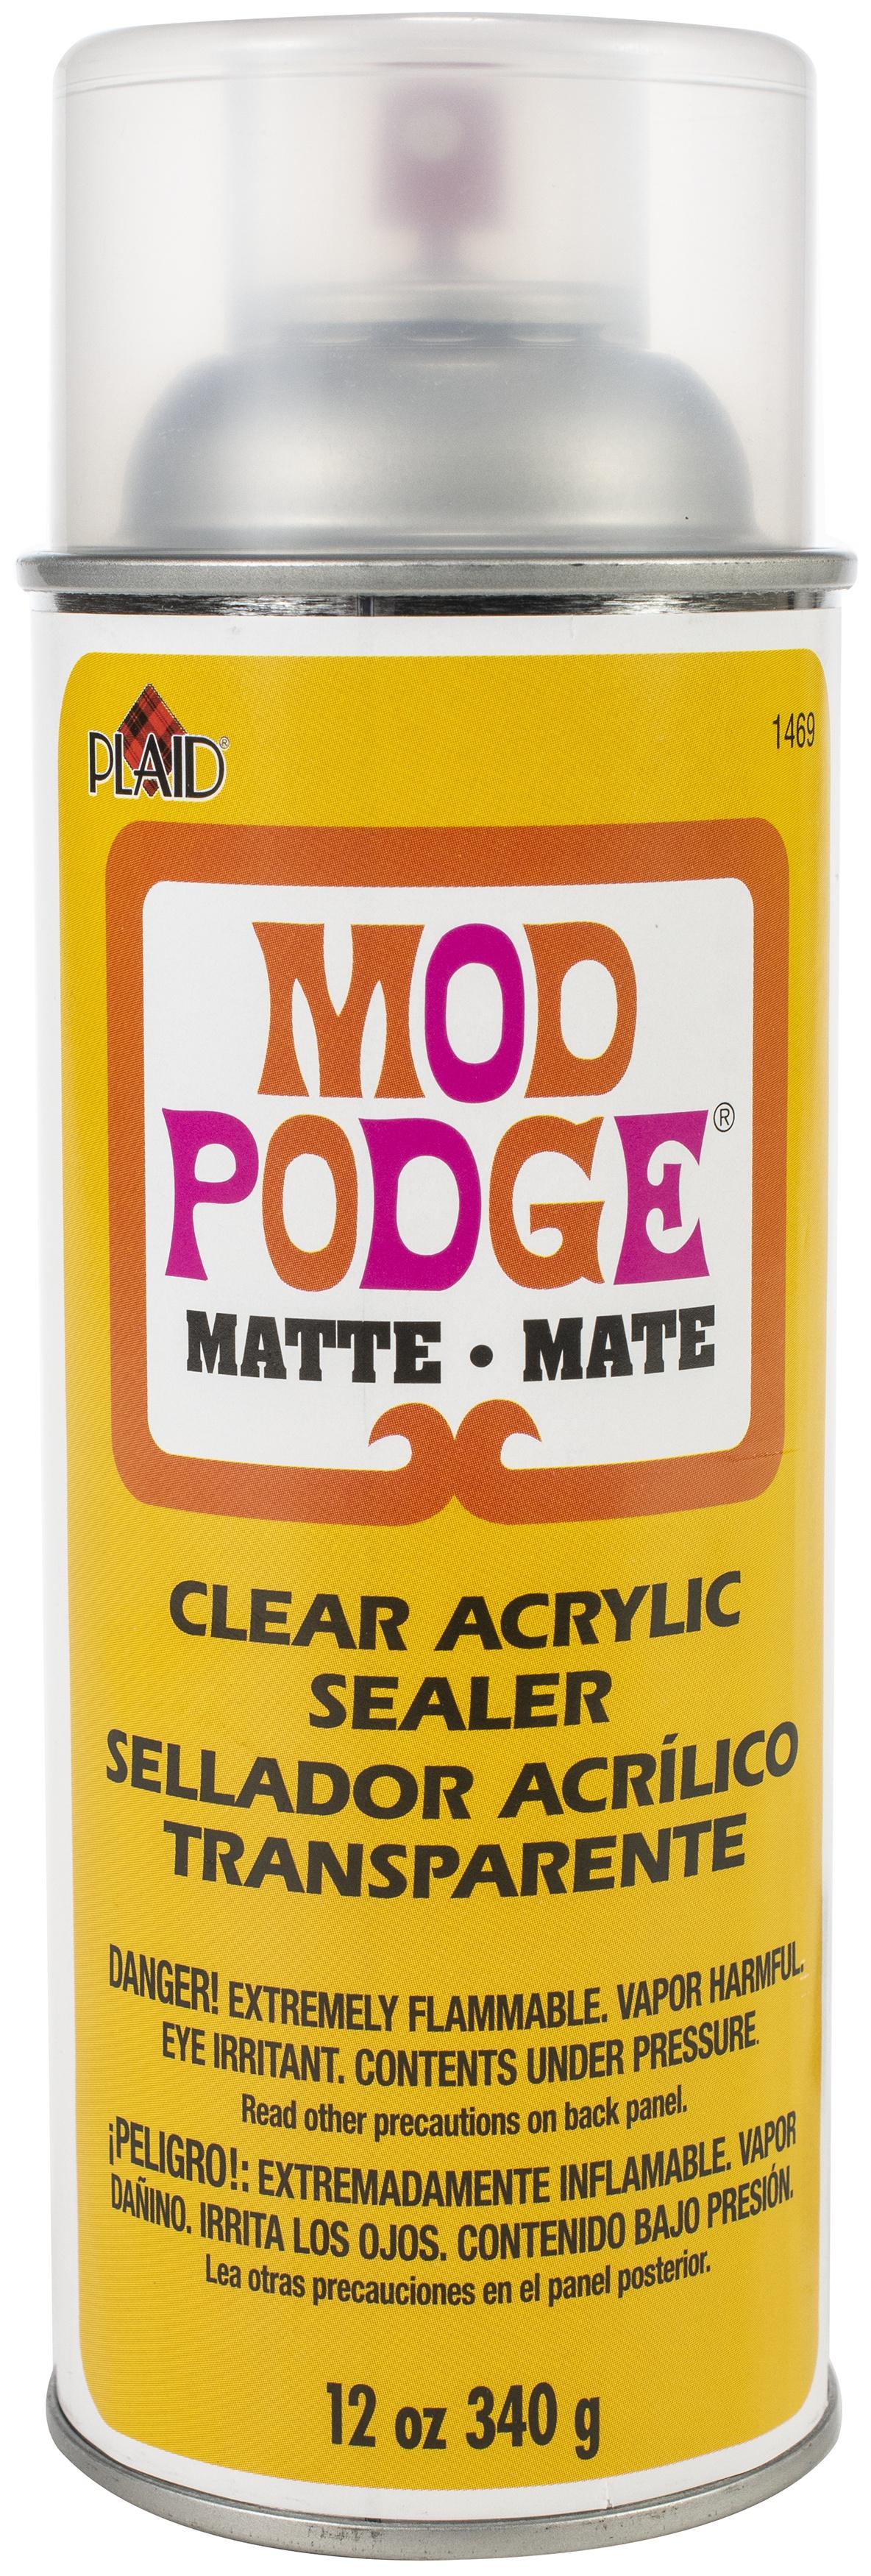 Mod Podge Clear Acrylic Aerosol Sealer-12oz Matte